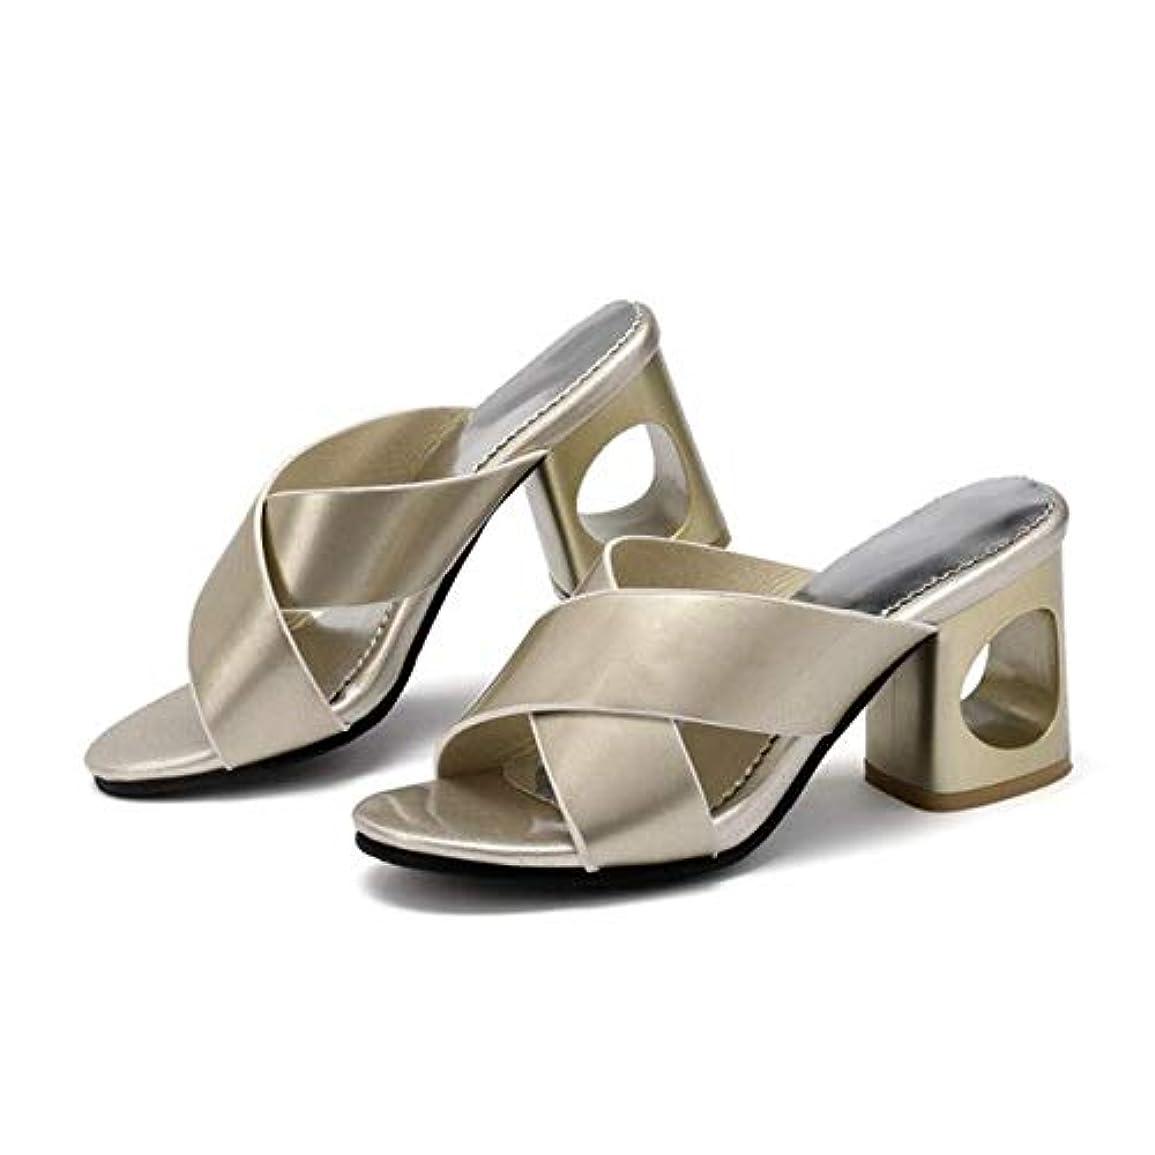 [AHZHDXZM] レディーススティレットサンダルビッグサイズ32-45女性夏ファッションレジャーシューズ女性プラットフォームピープトウ??サンダルビーチスリッパ8ゴールド女性用ハイヒールヒール